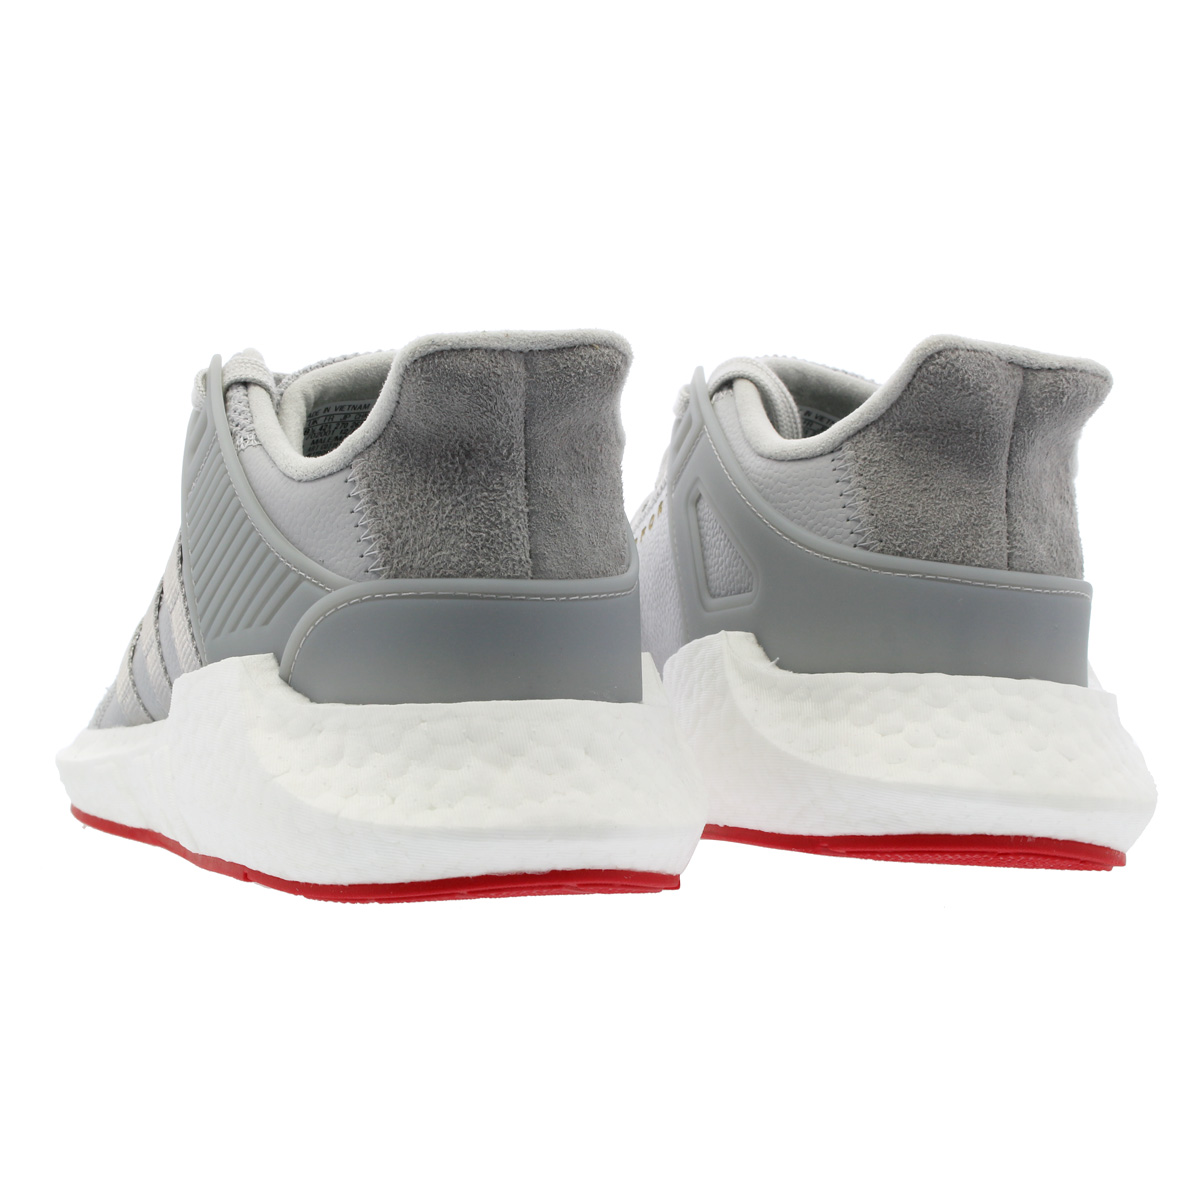 half off eb68d a8be8 adidas EQT SUPPORT 93 17 Adidas EQT support 93 17 MATTE SILVER MATTE SILVER RUNNING  WHITE